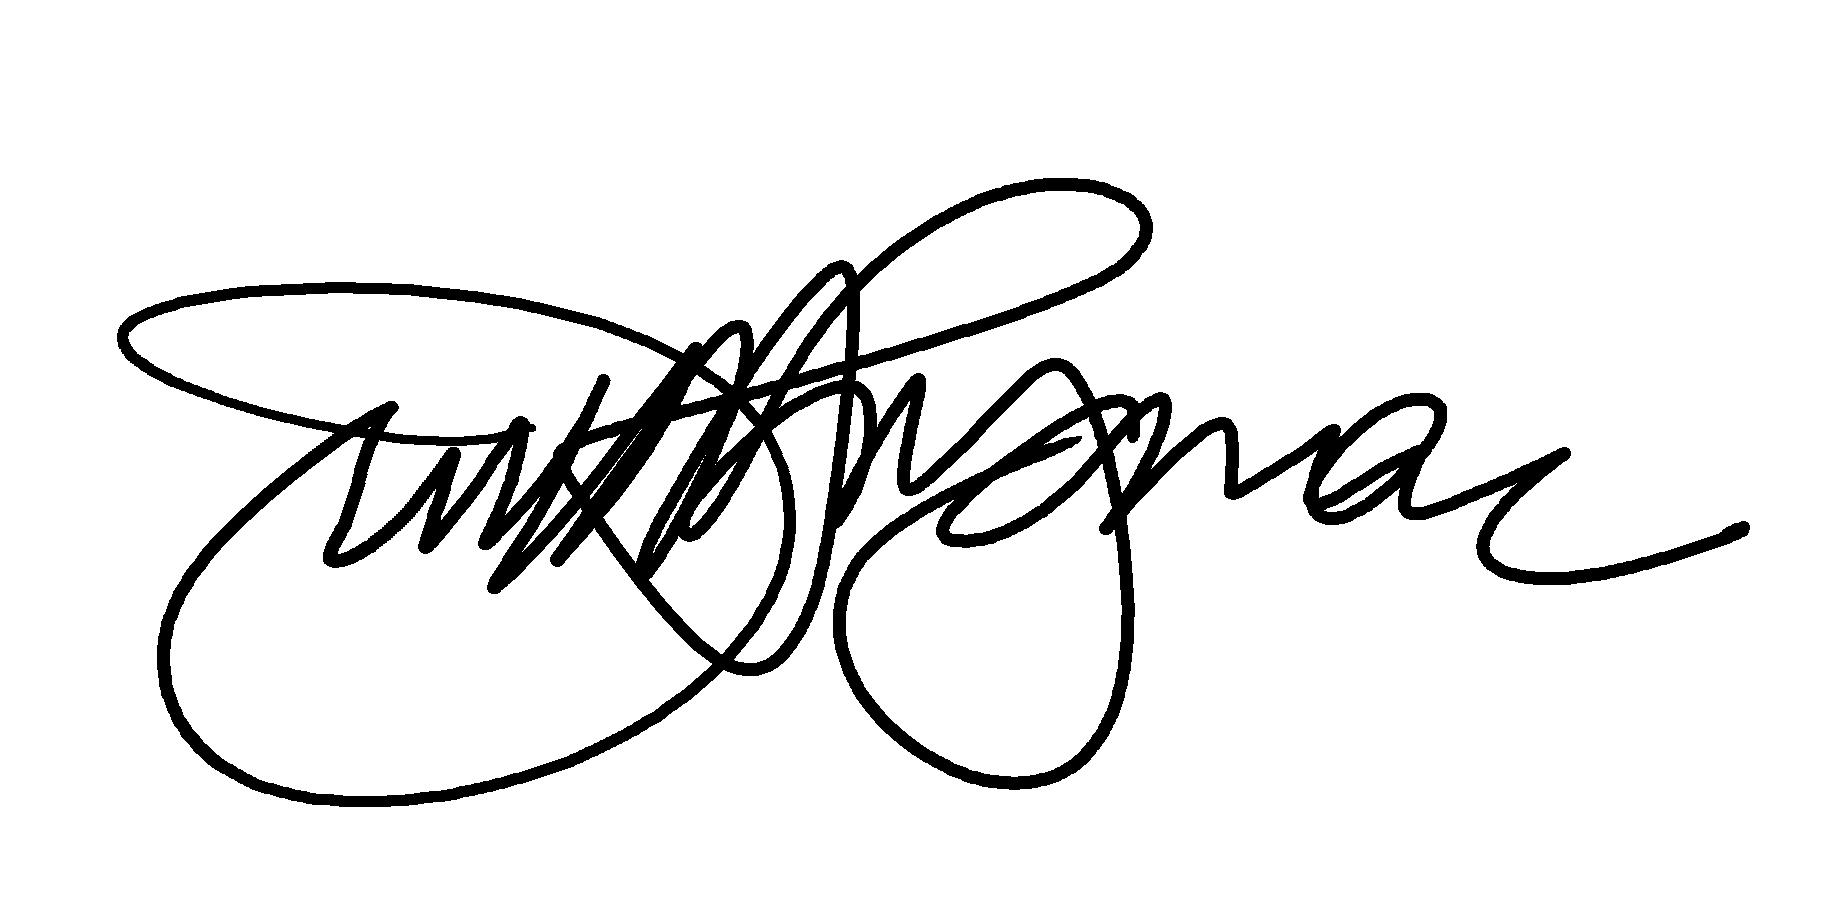 julie M. abijanac's Signature